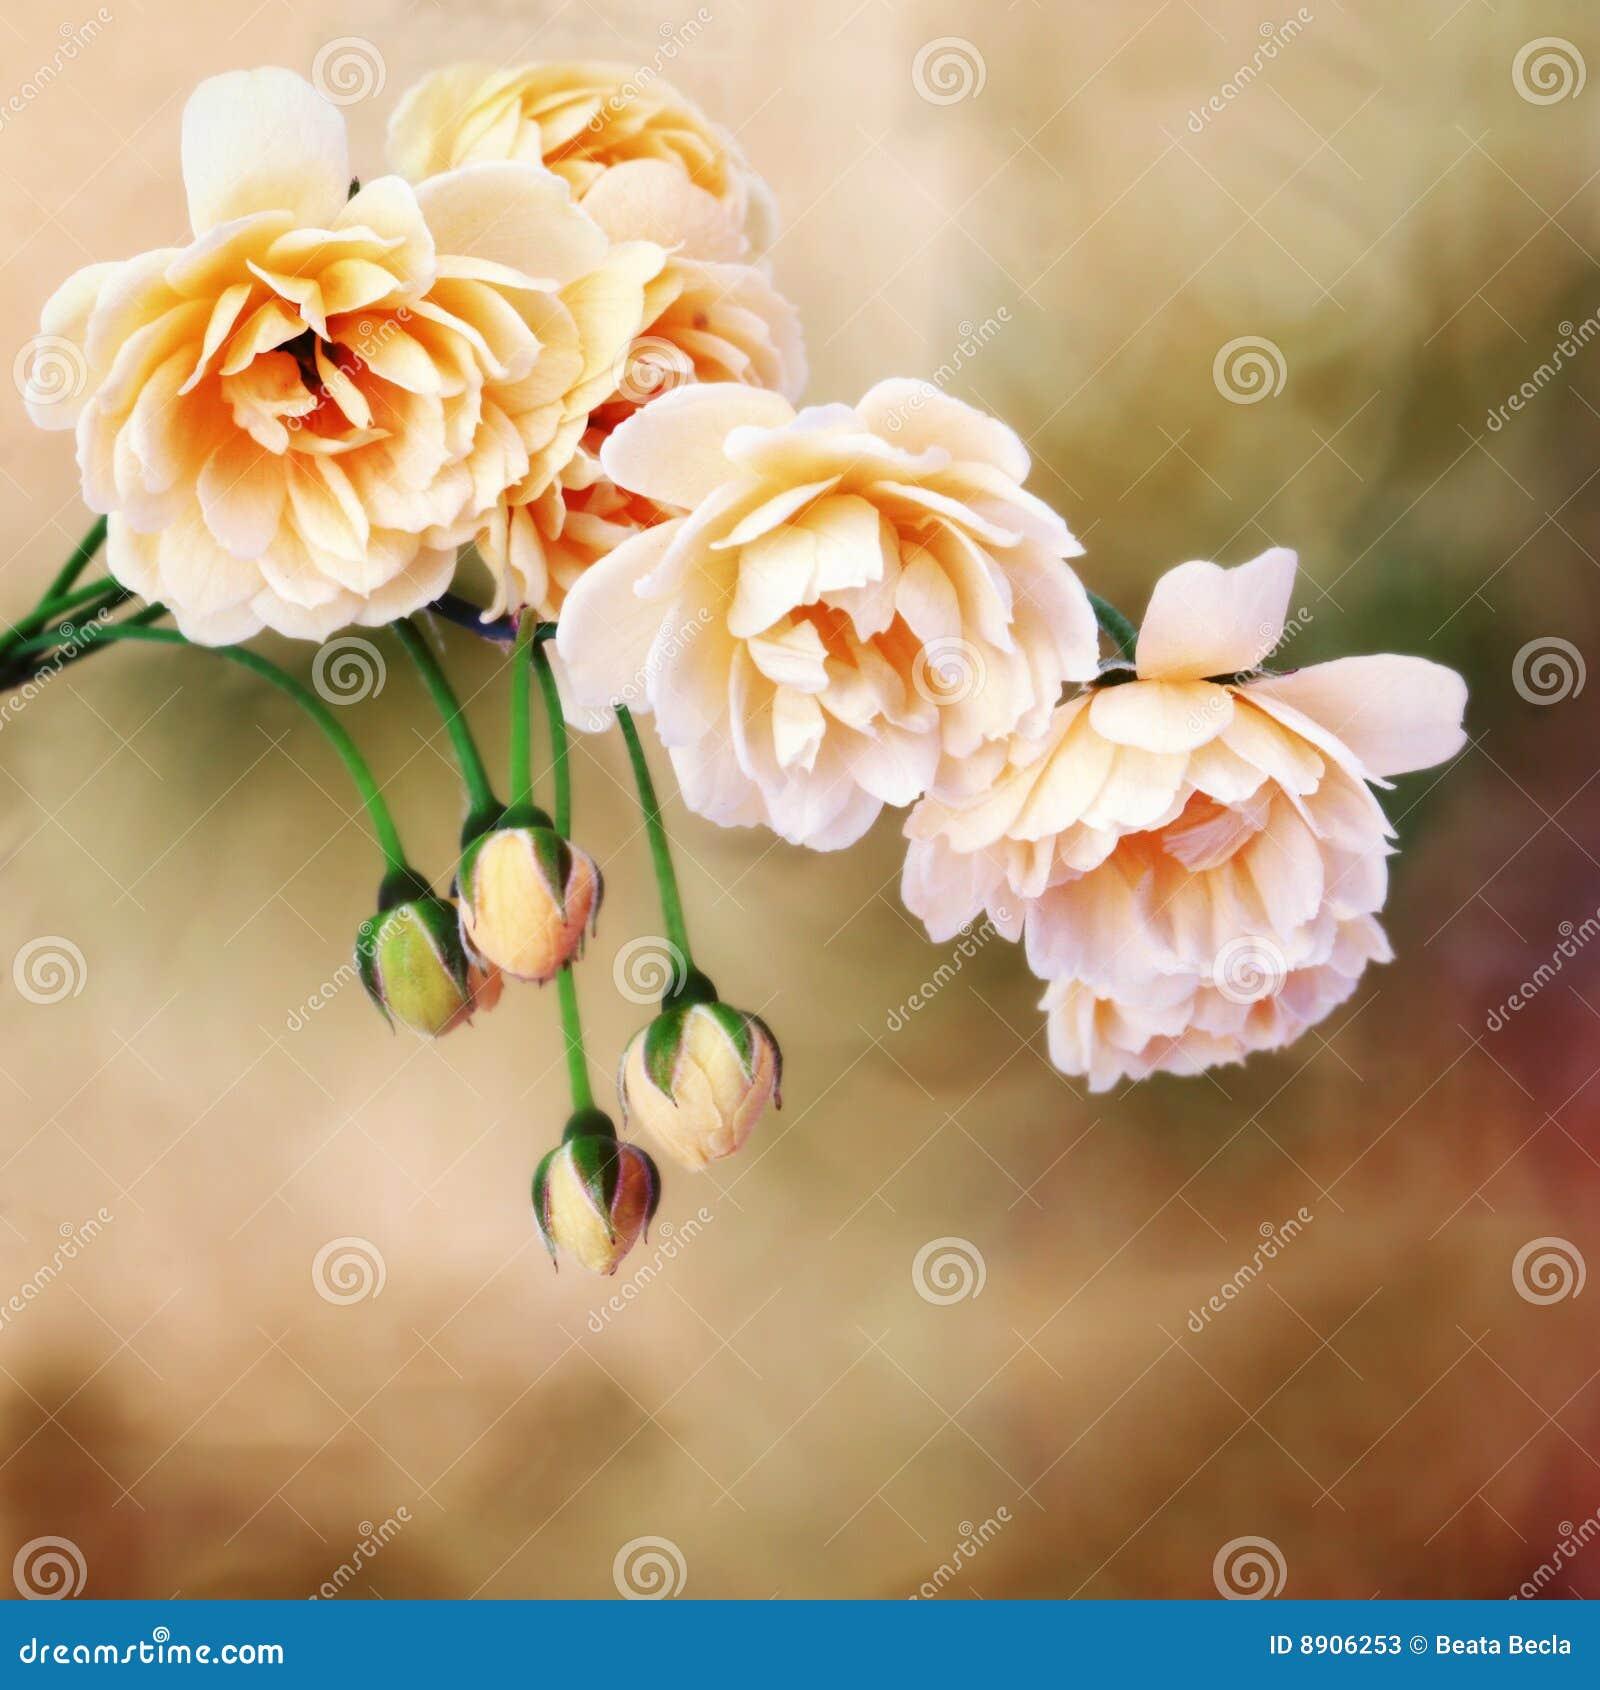 Yellow miniature roses